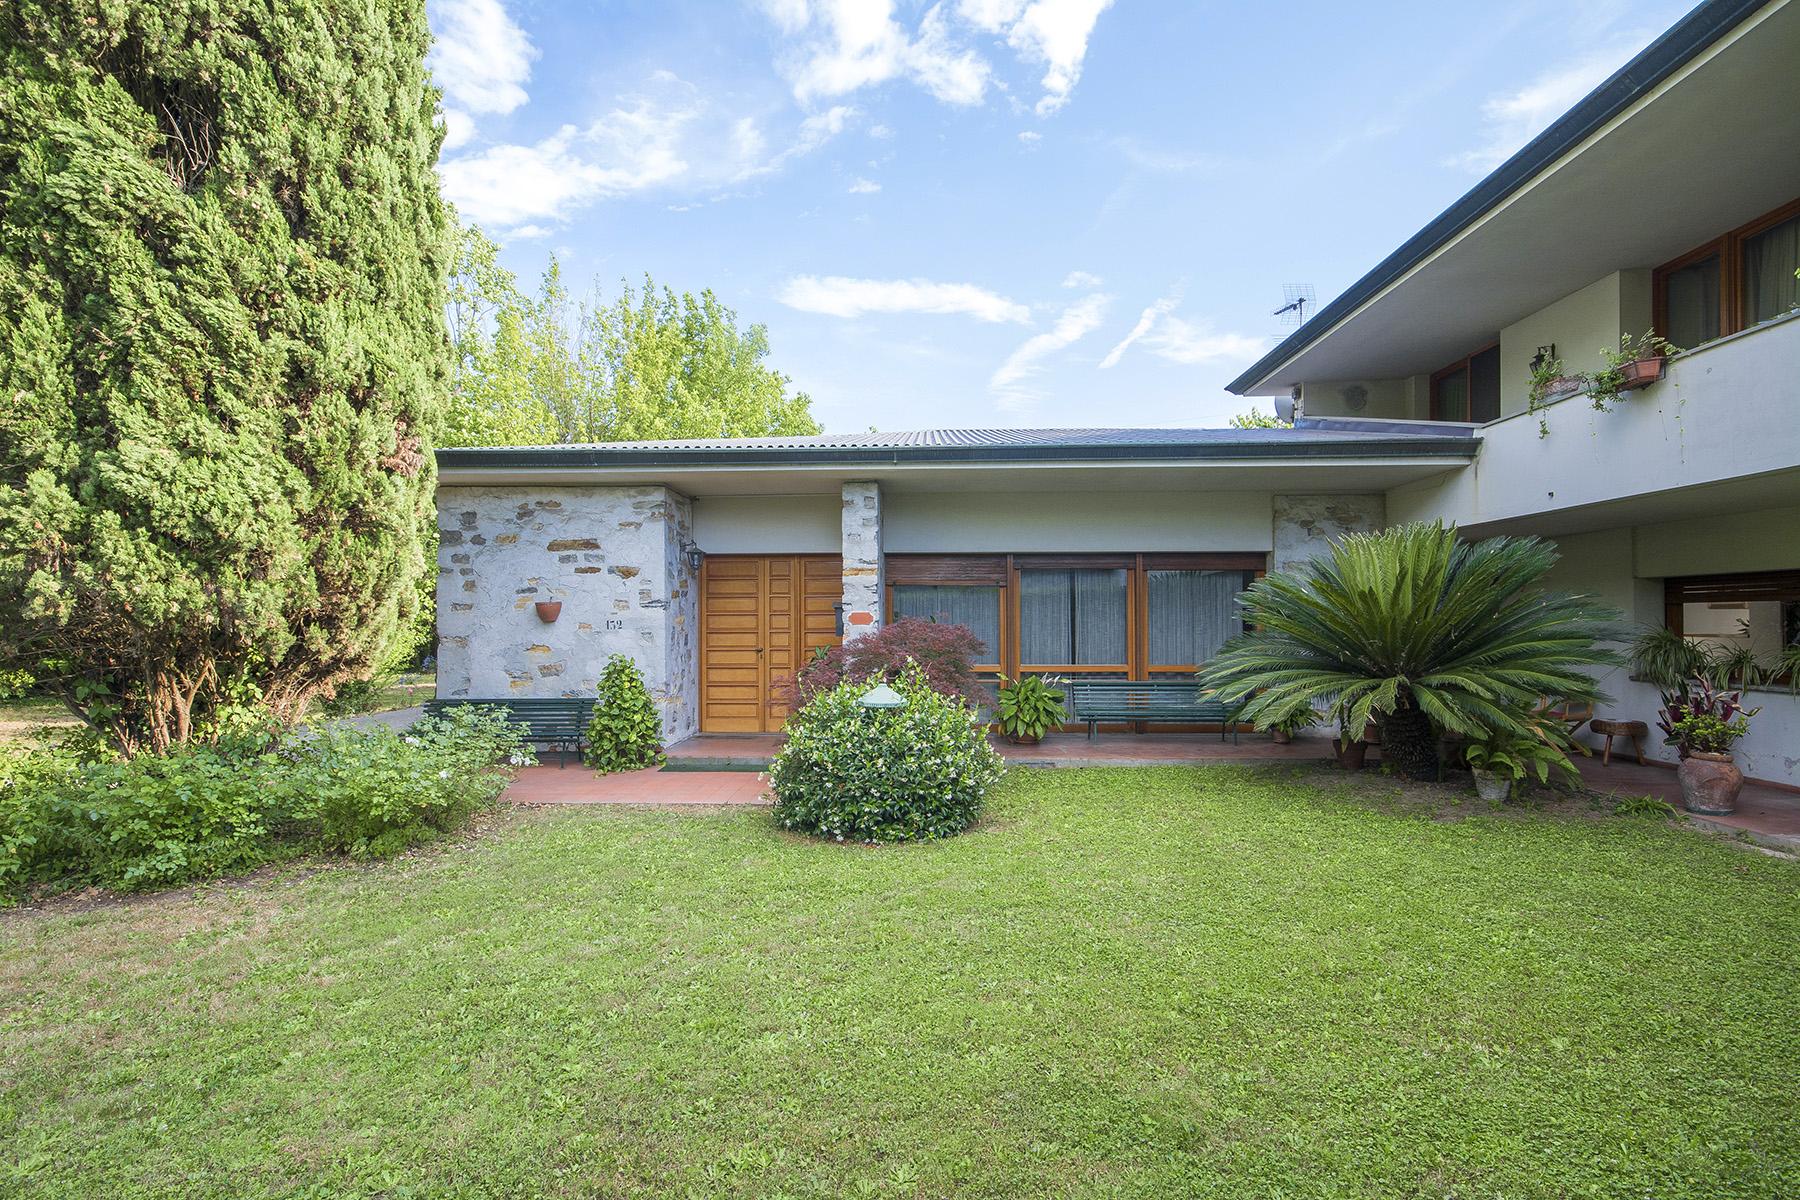 Villa in Vendita a Capannori:  5 locali, 500 mq  - Foto 1